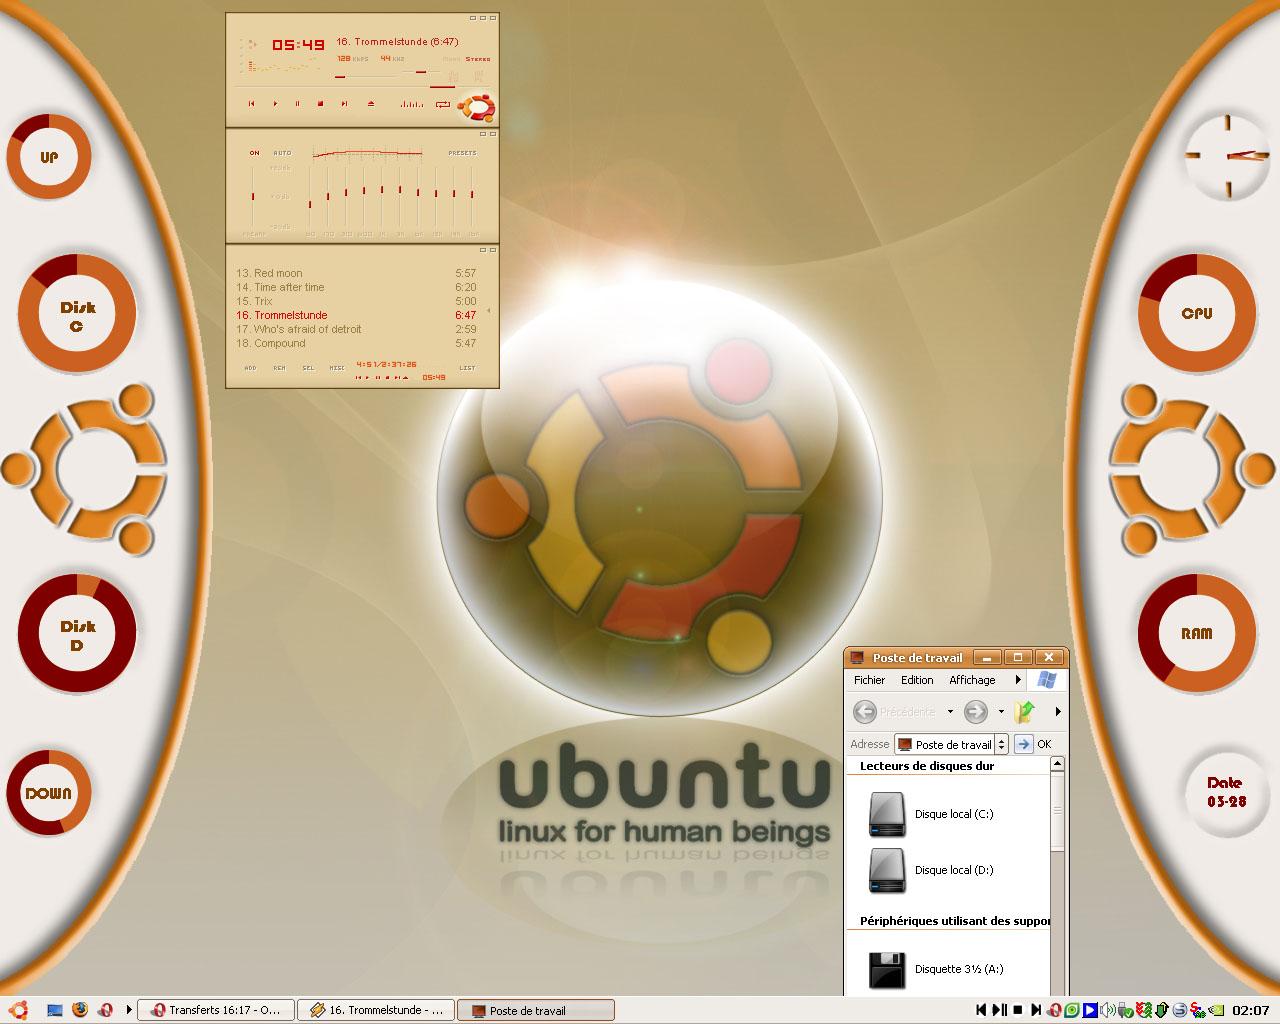 Title: Like Ubuntu